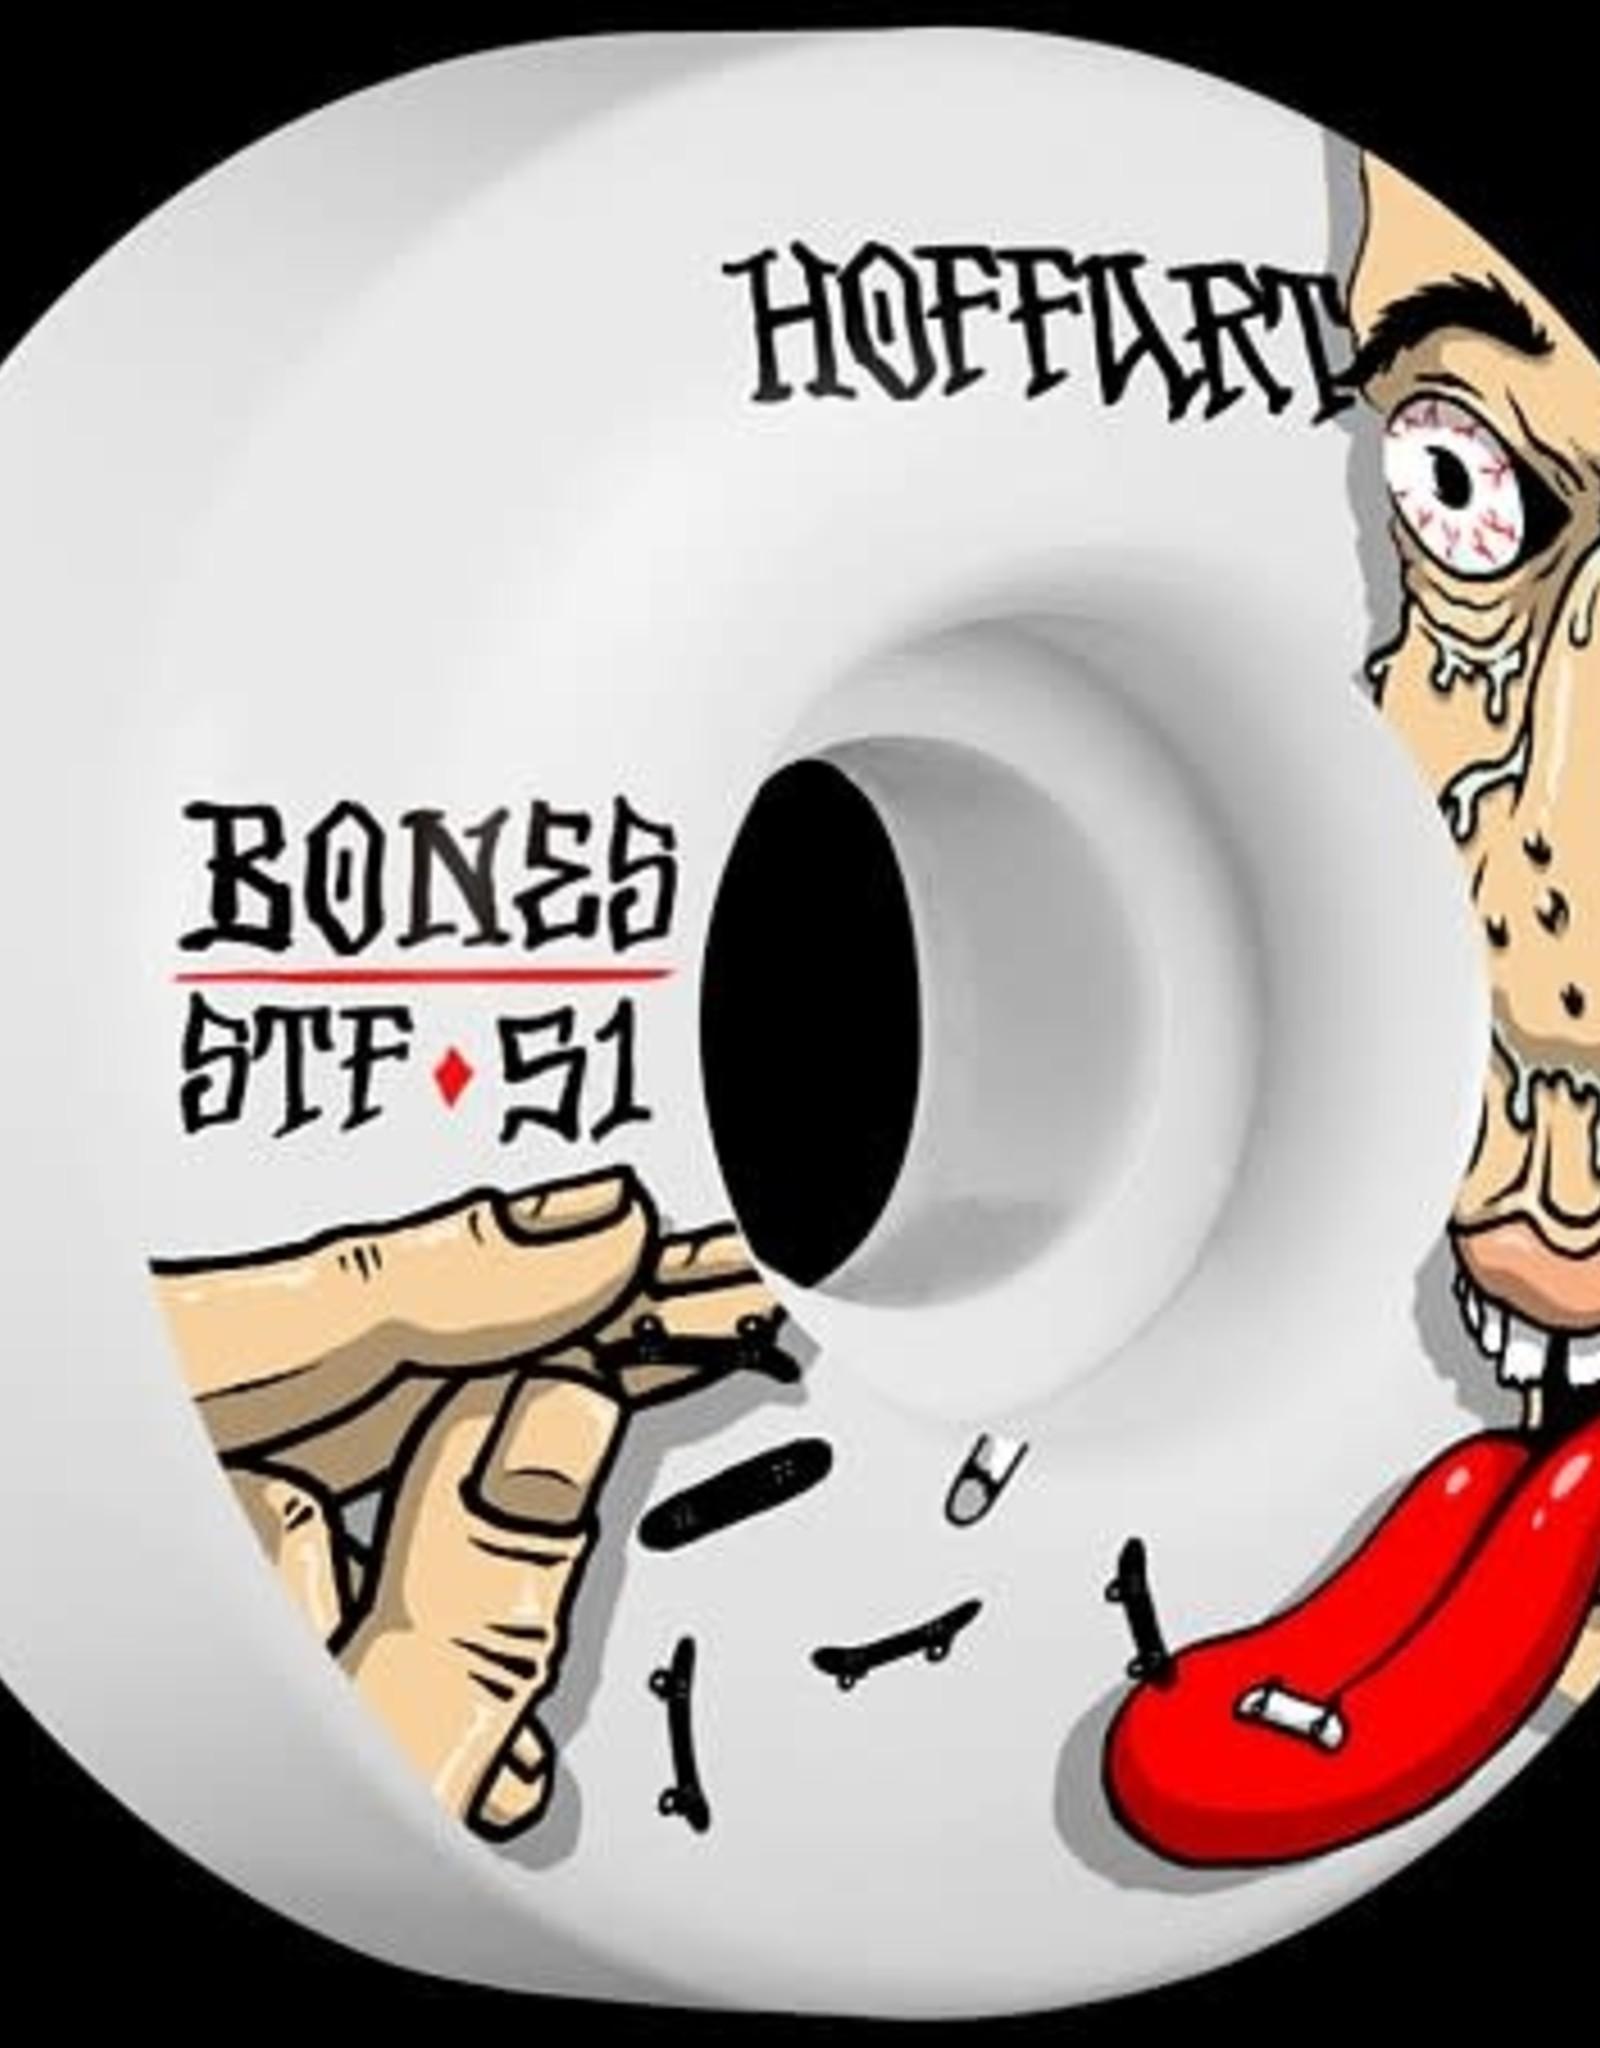 Bones BONES - STREET TECH FORMULA WHEELS - HOFFART ADDICTED 103A - 53MM